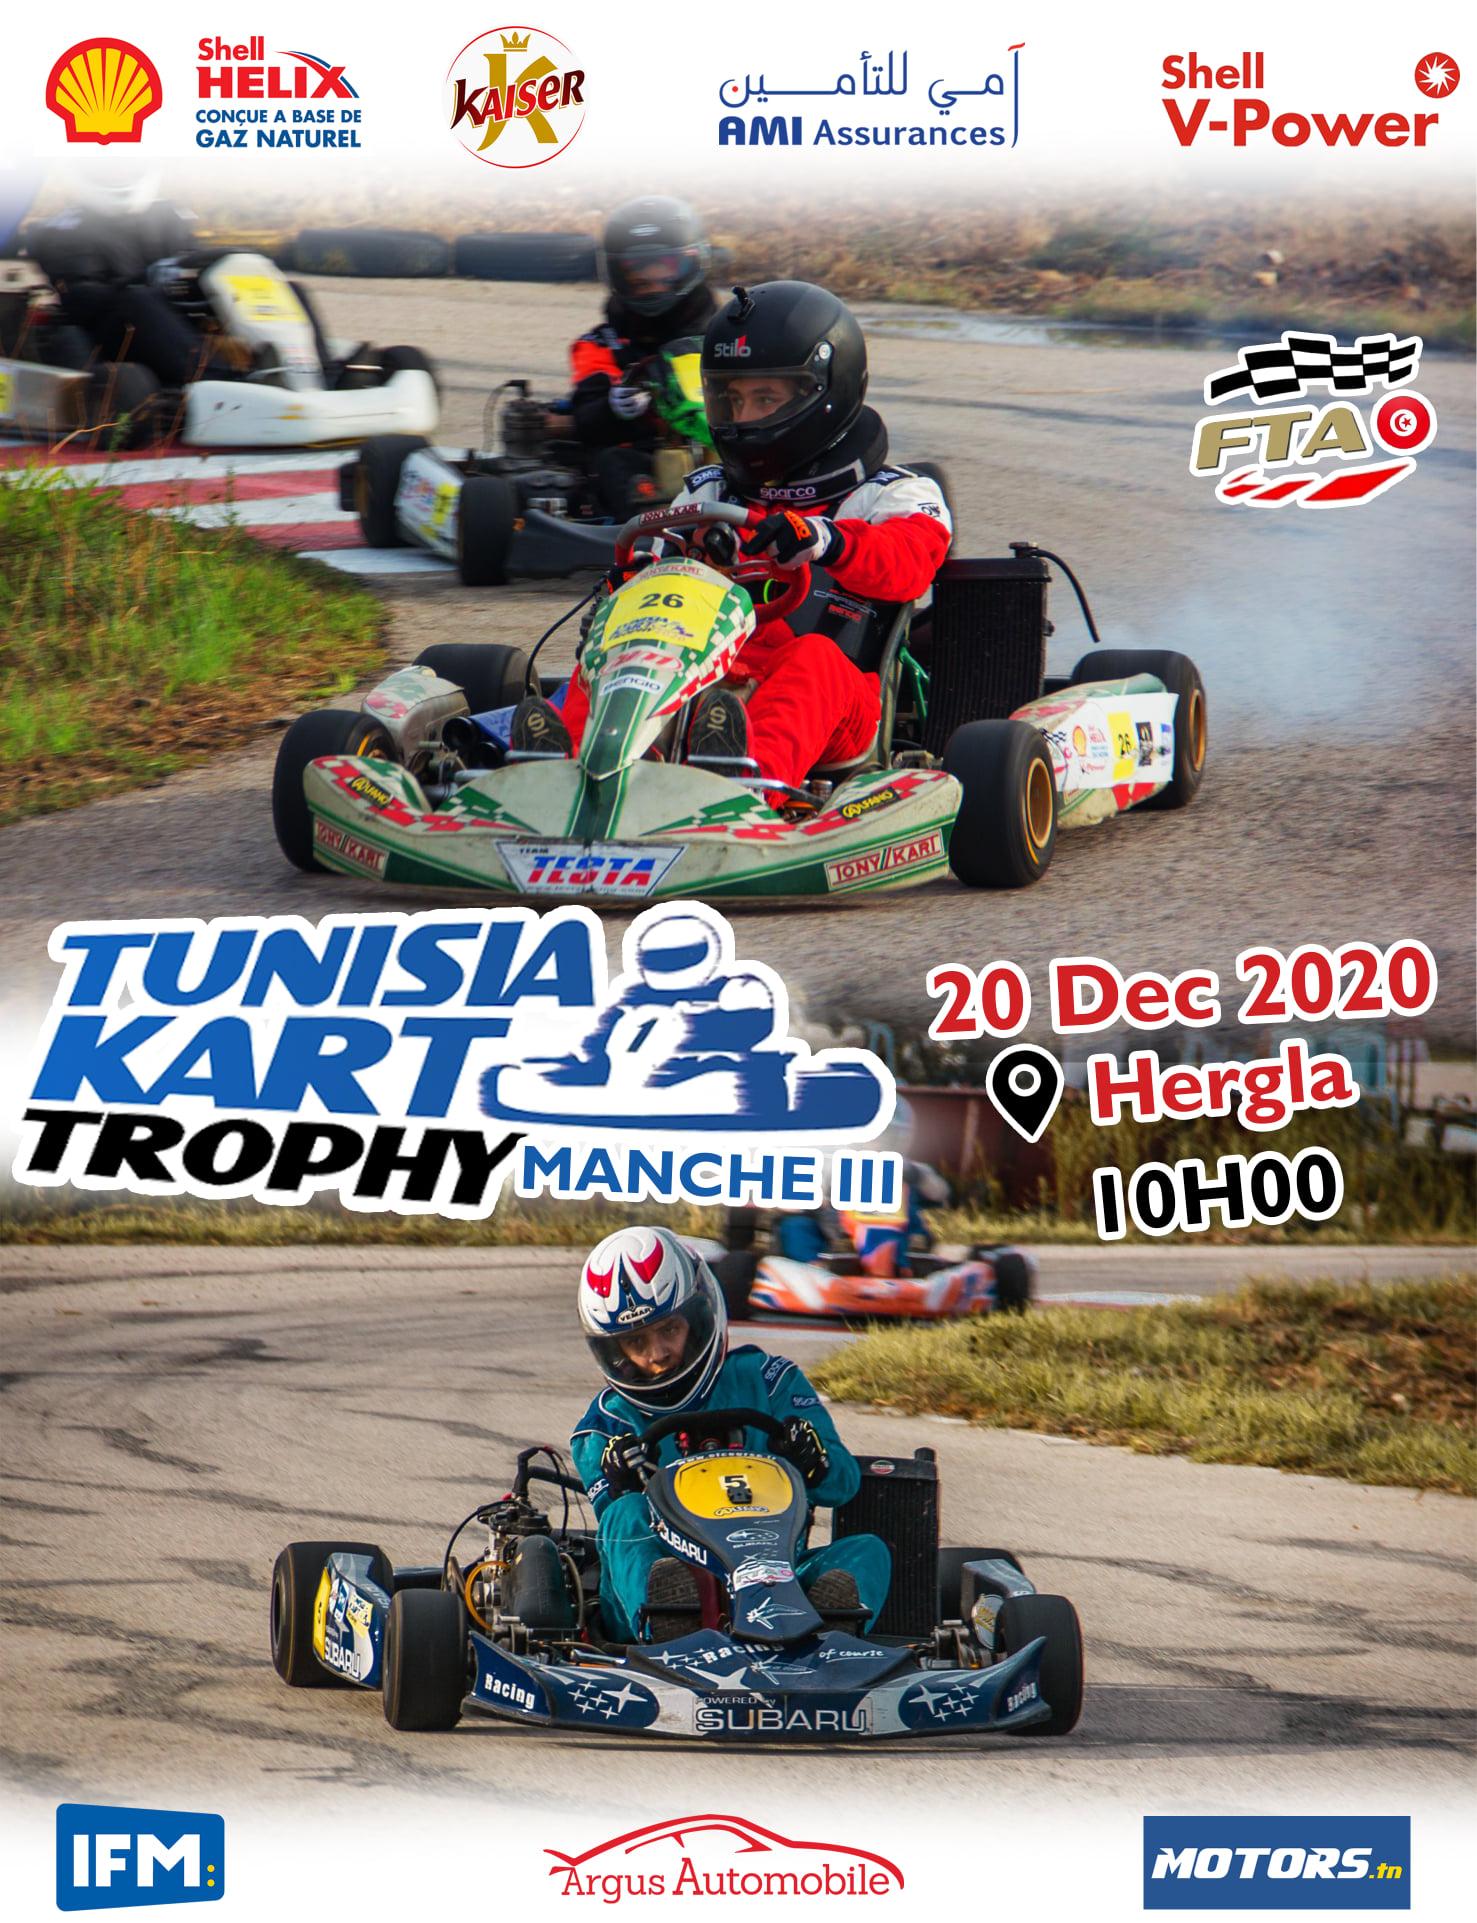 Manche 3 – Tunisia Kart Trophy 2020